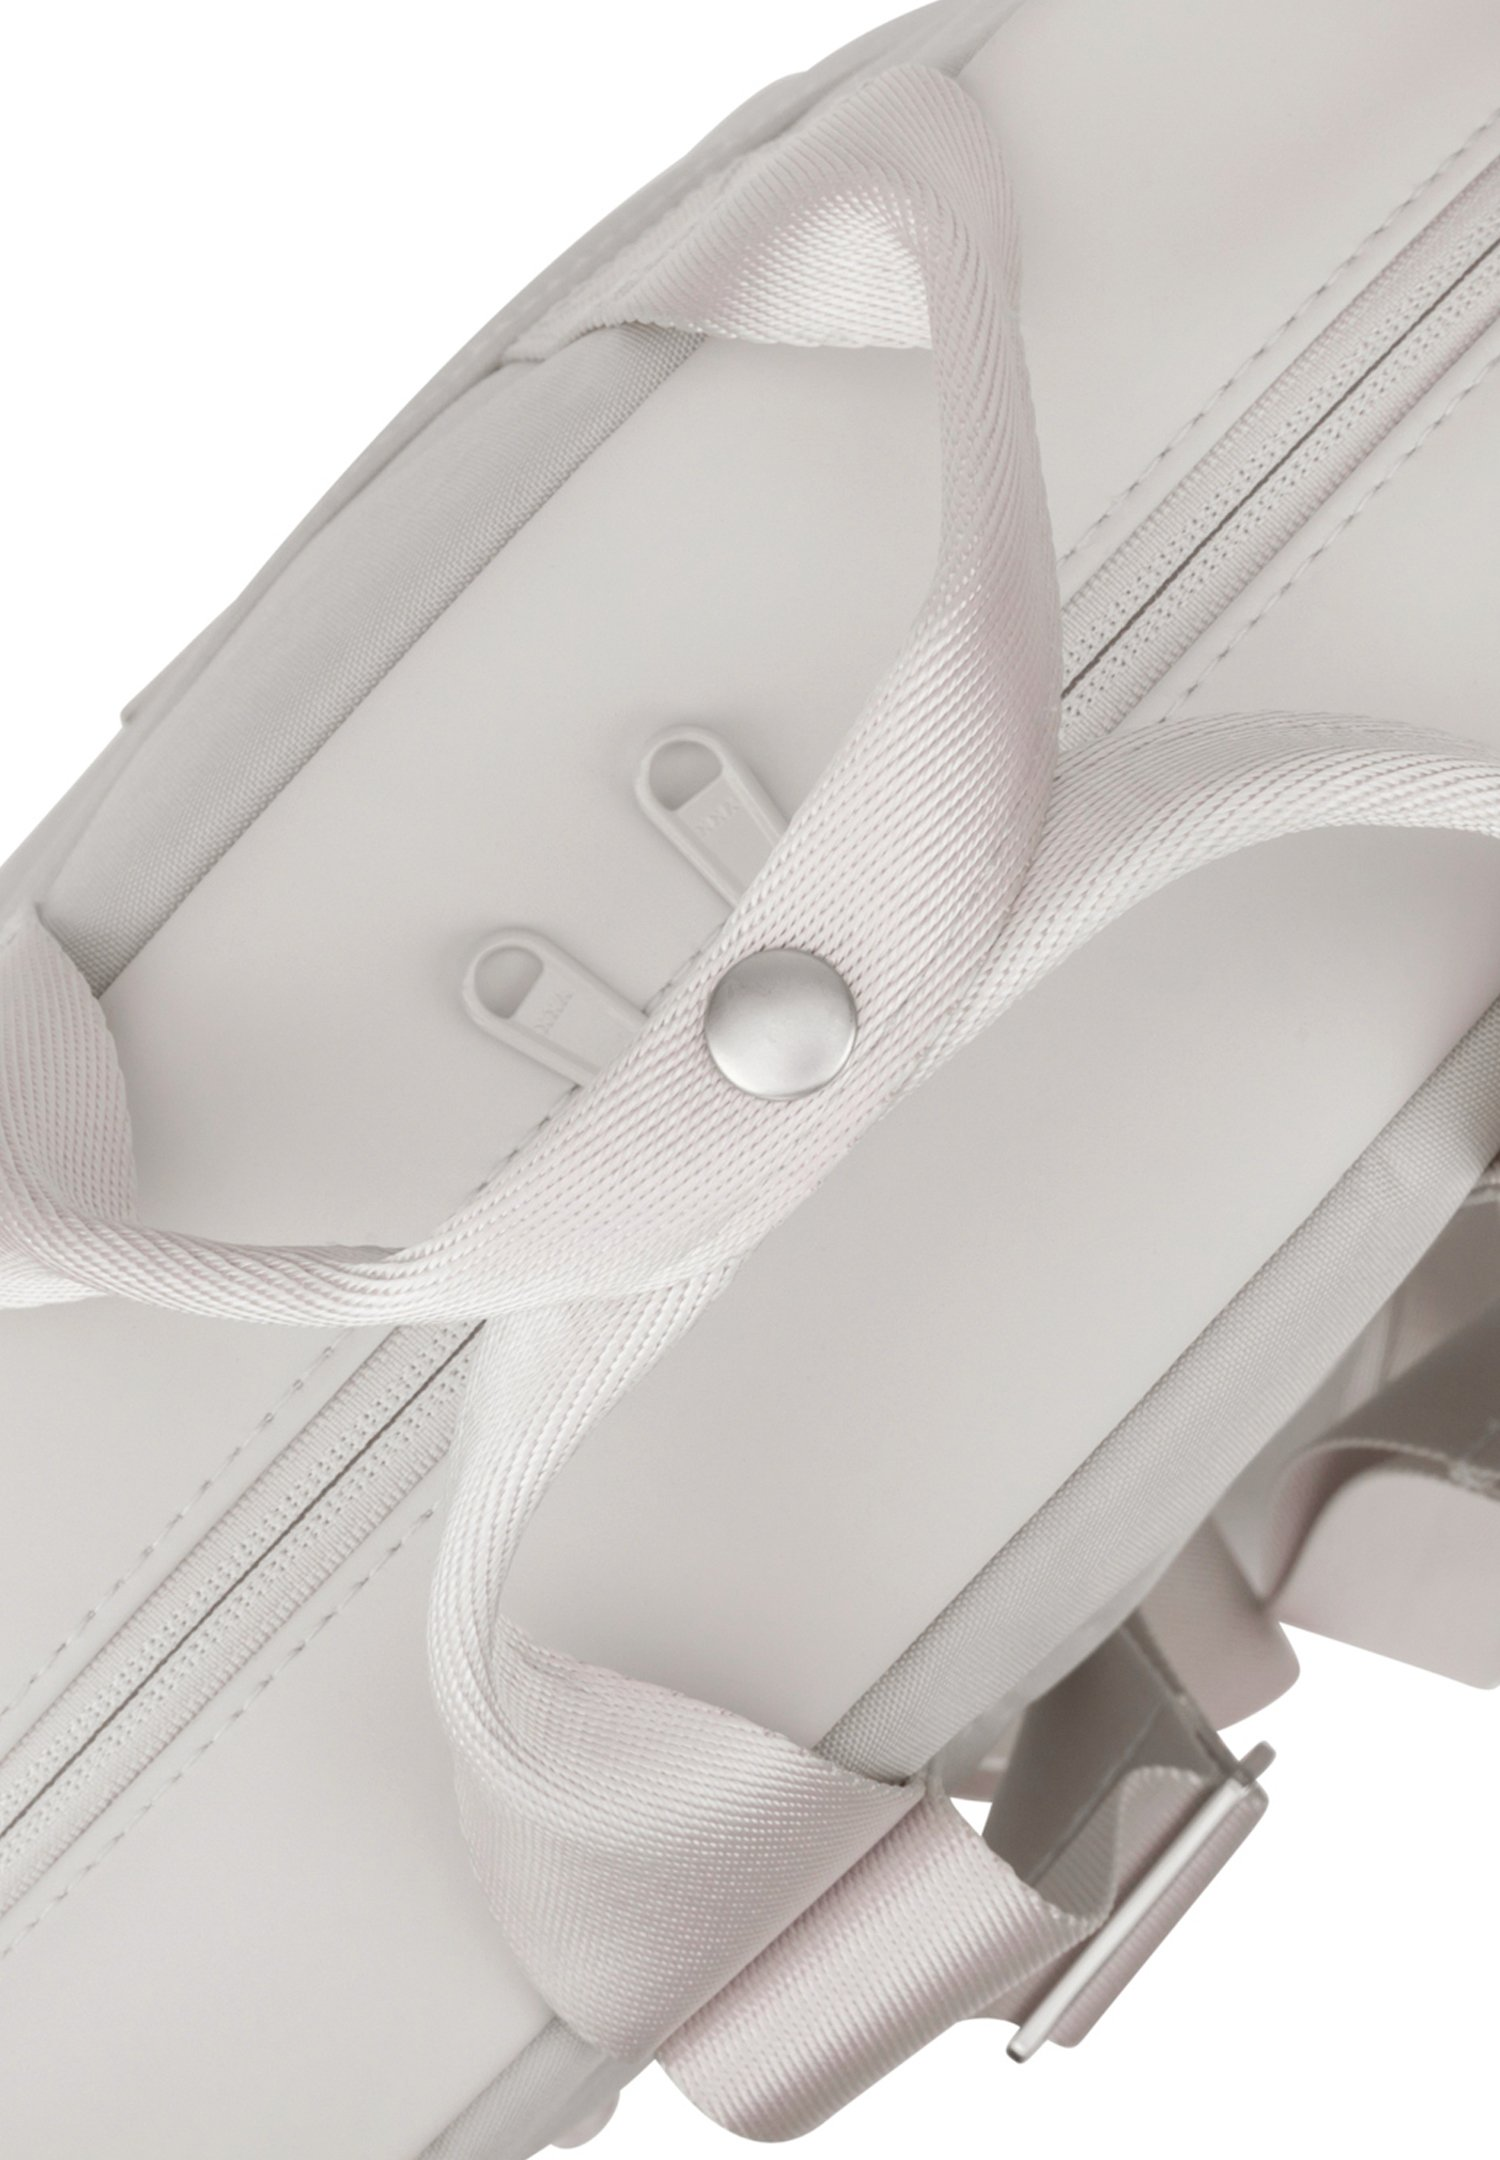 Johnny Urban JONA - Tagesrucksack - beige - Herrentaschen kAepk